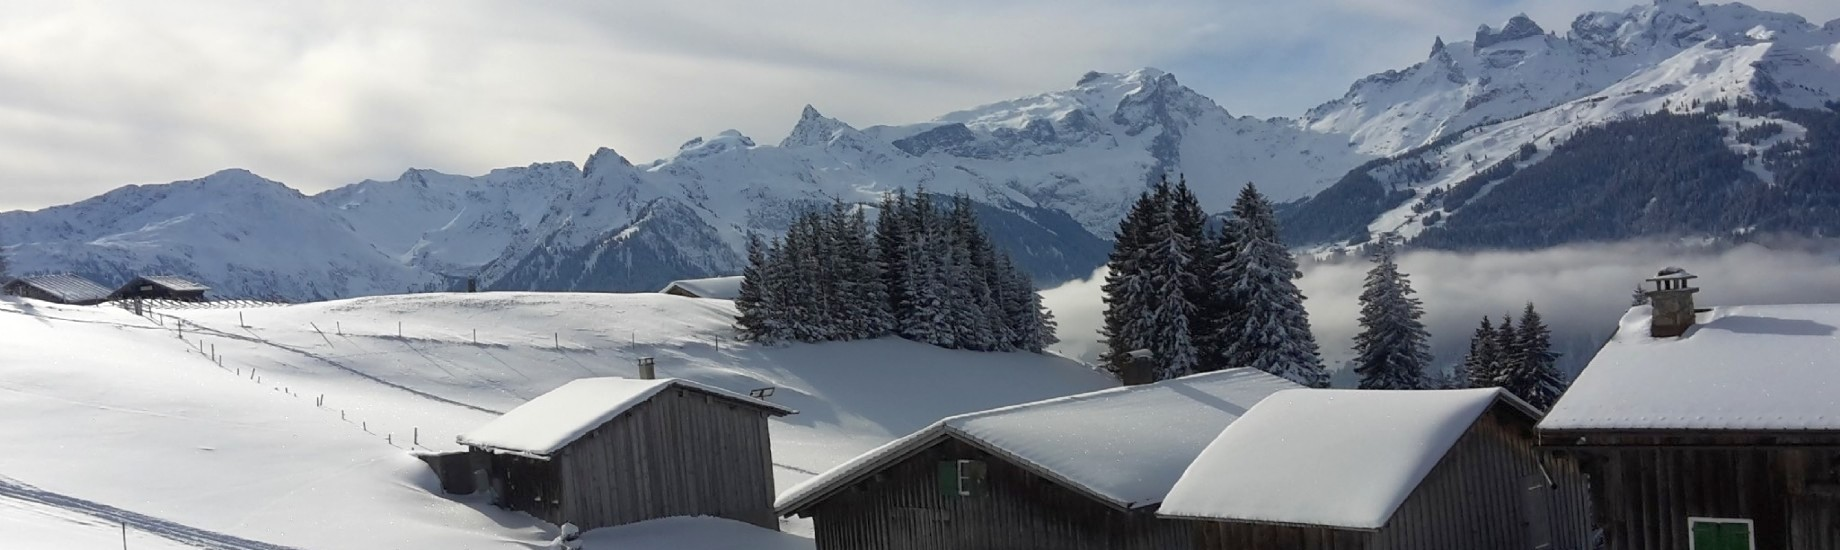 hotel-bergerhof-winterurlaub-montafon-5-s